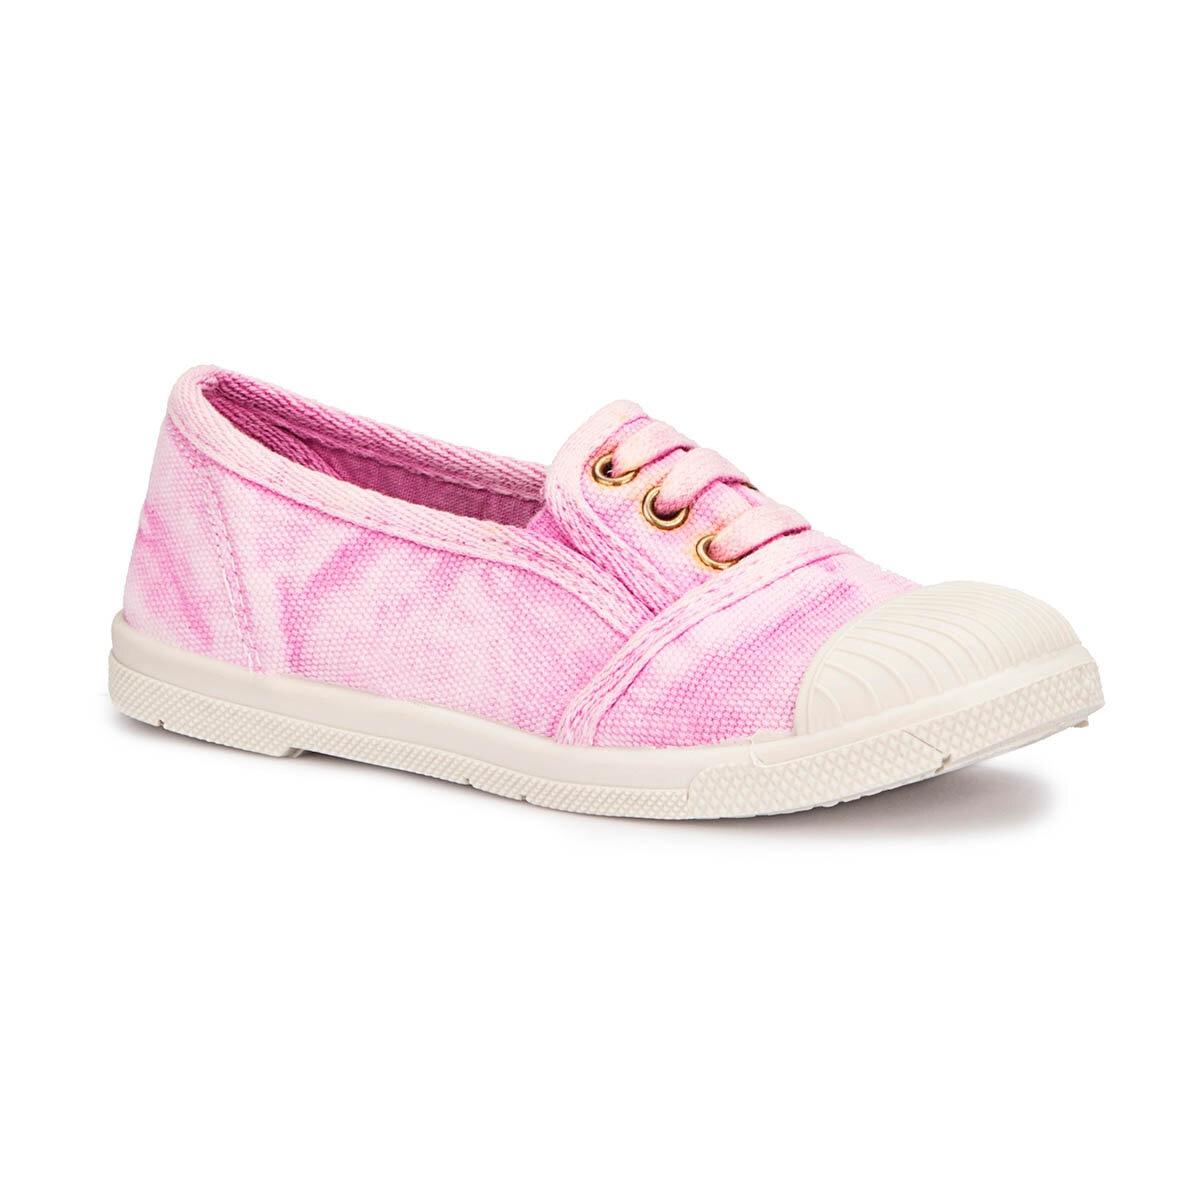 FLO 71.509307.F Pink Female Child Slip On Shoes Polaris